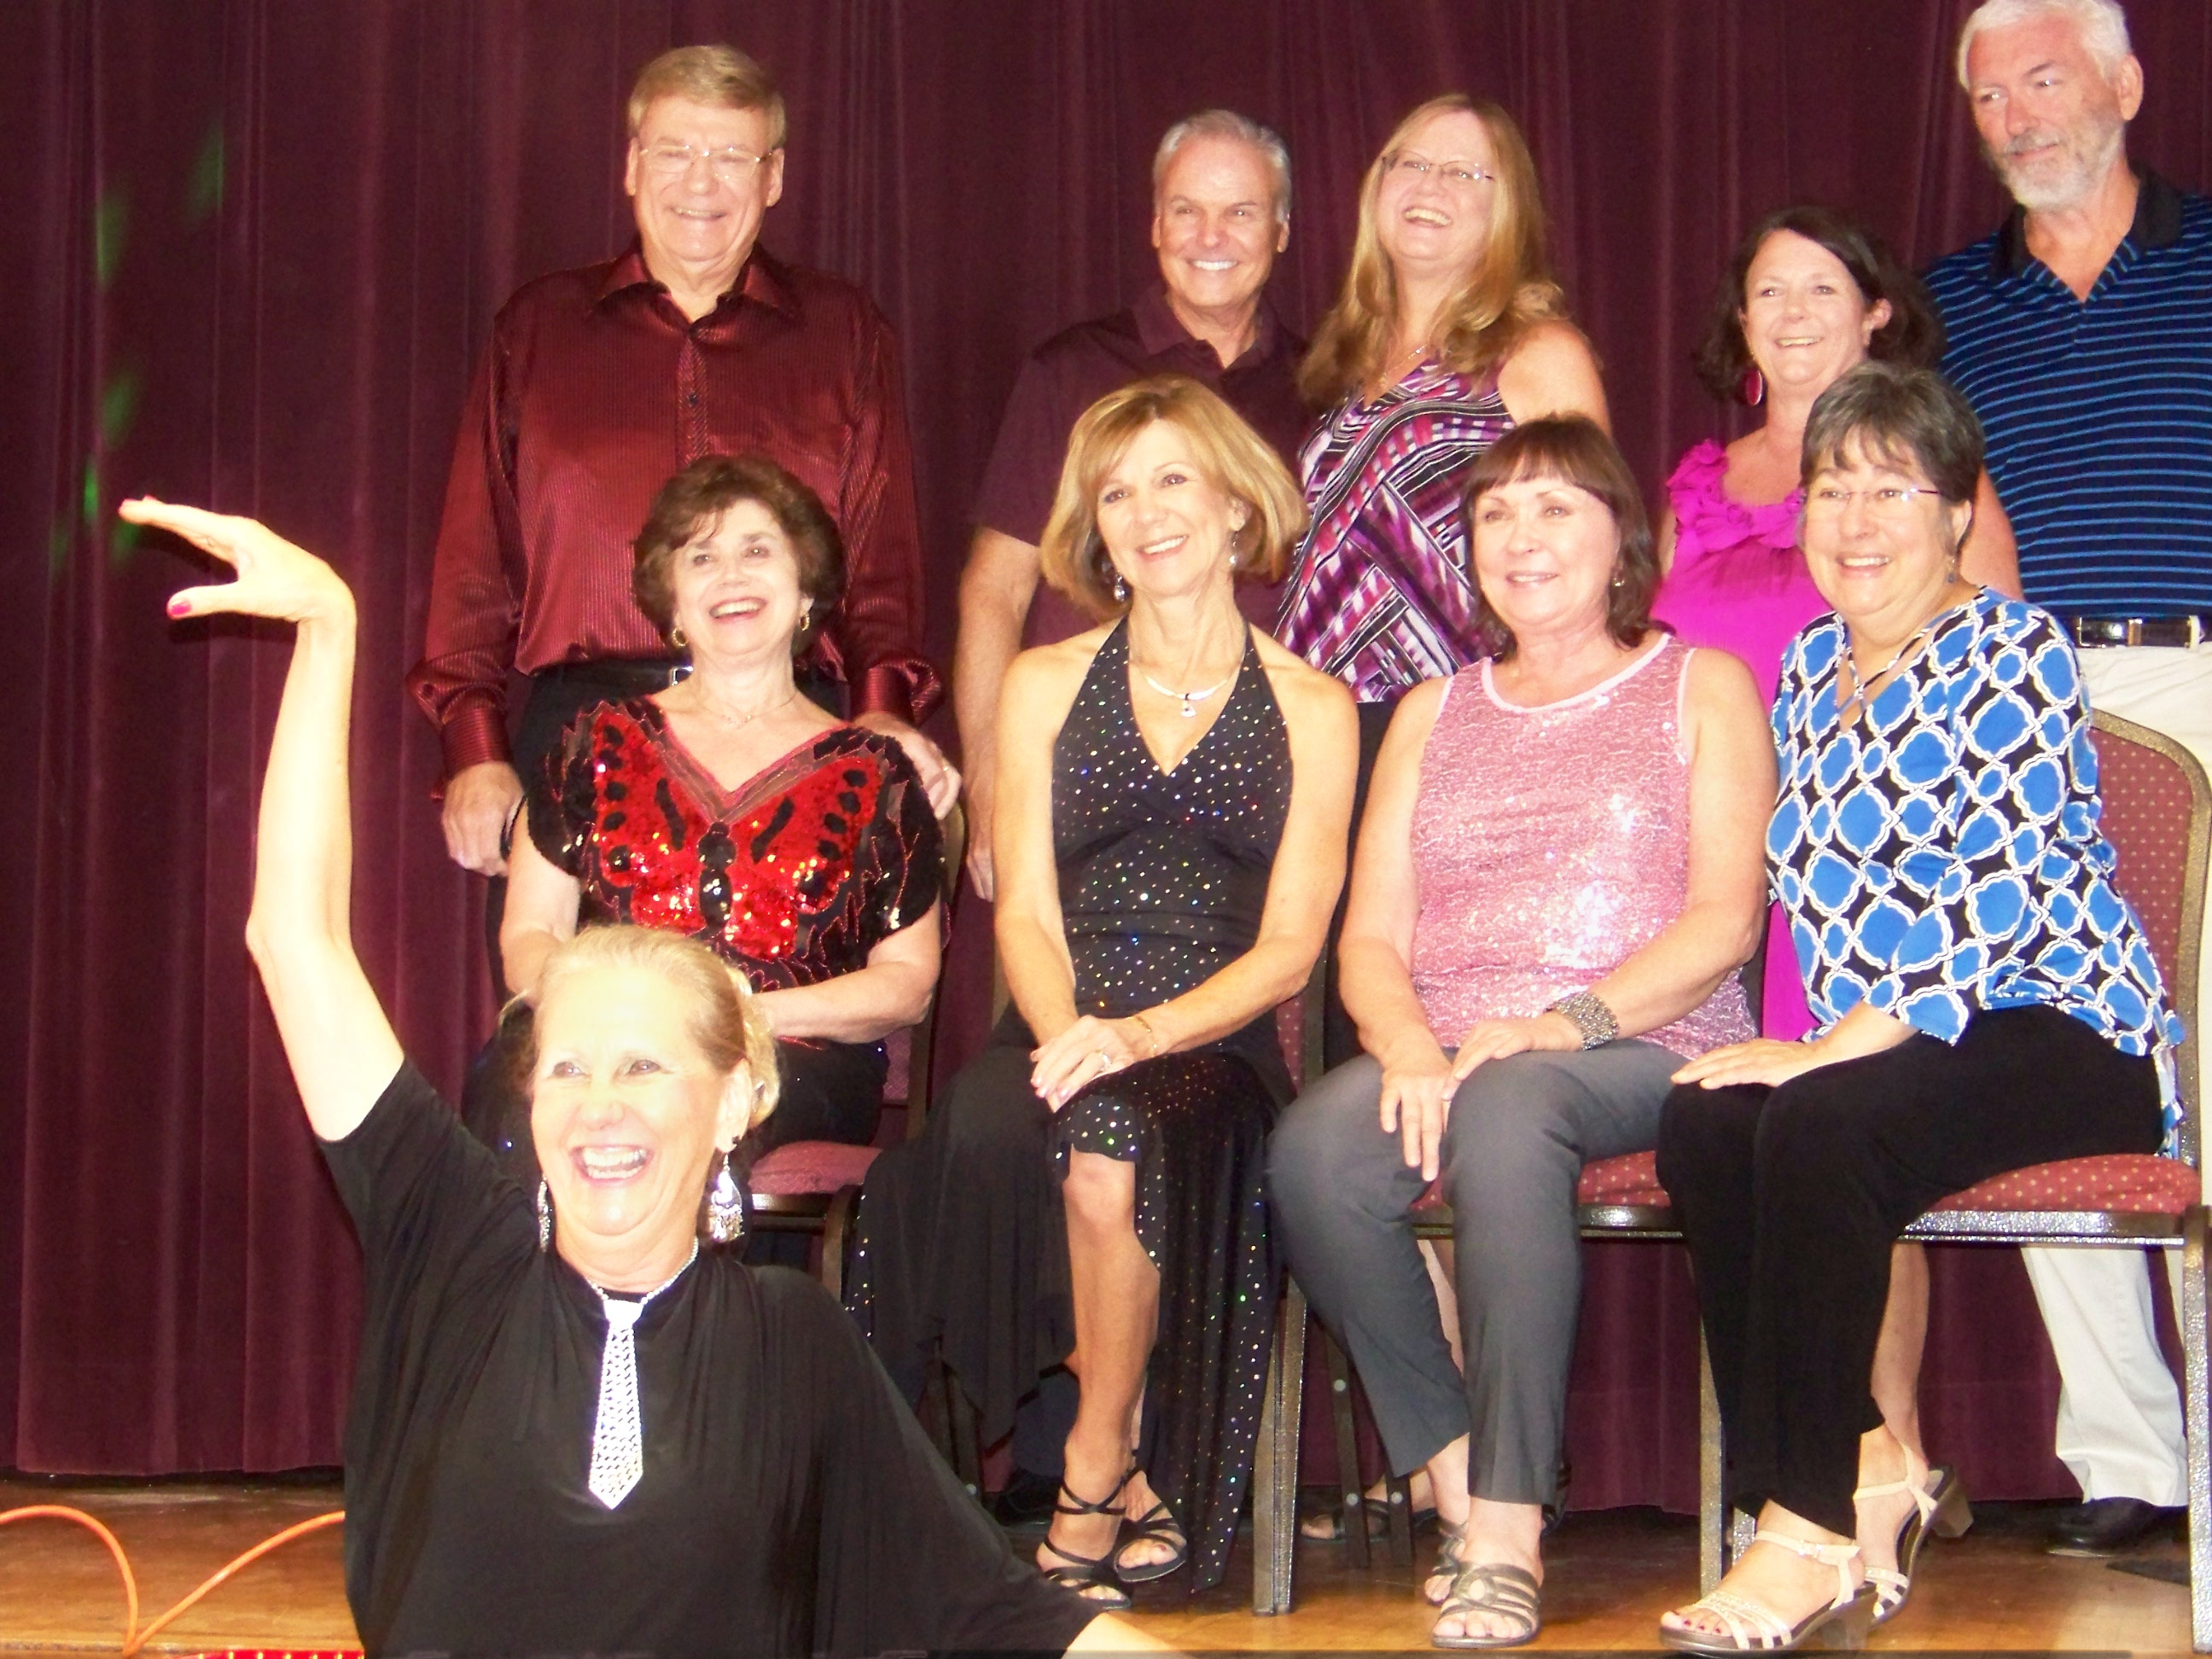 USA Dance Board with Jamboree Organizer Rosemary Farrell